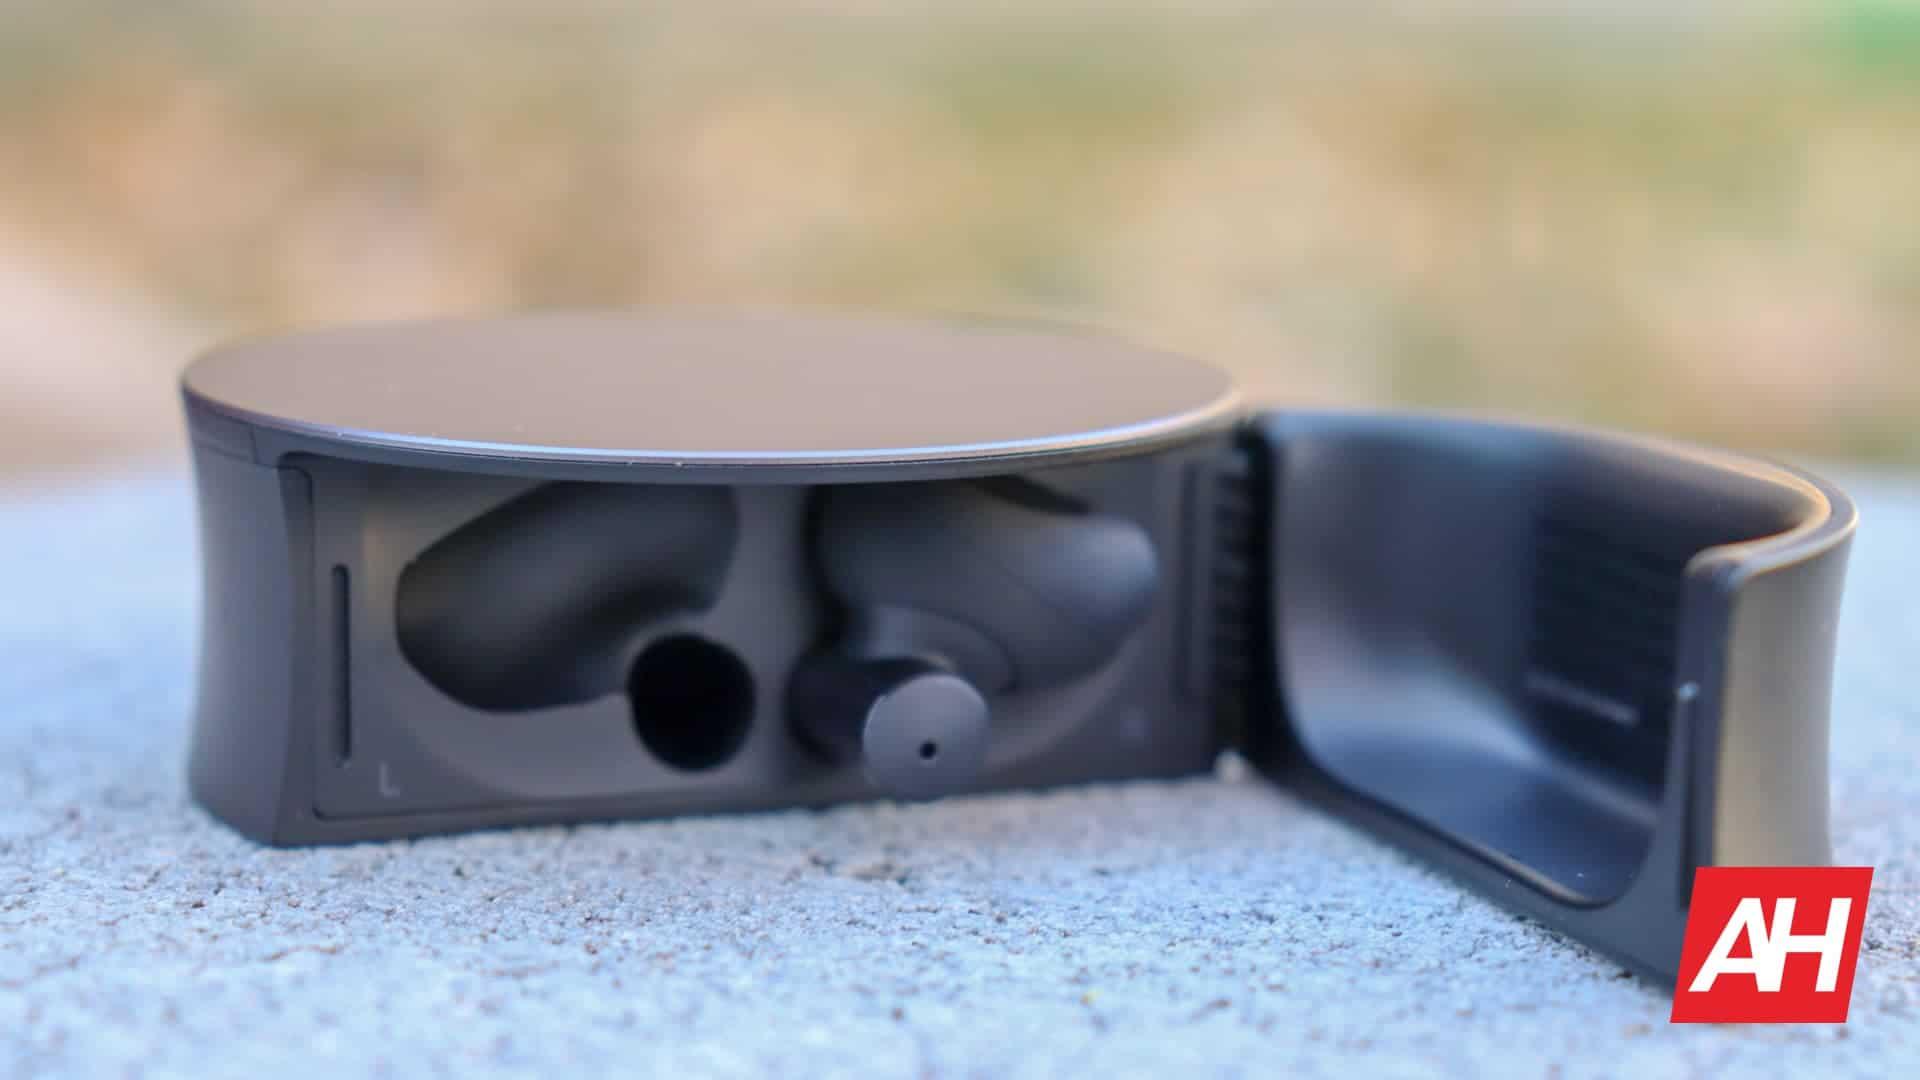 01 4 Oddict Twig Earbuds Hardware Review DG AH 2020